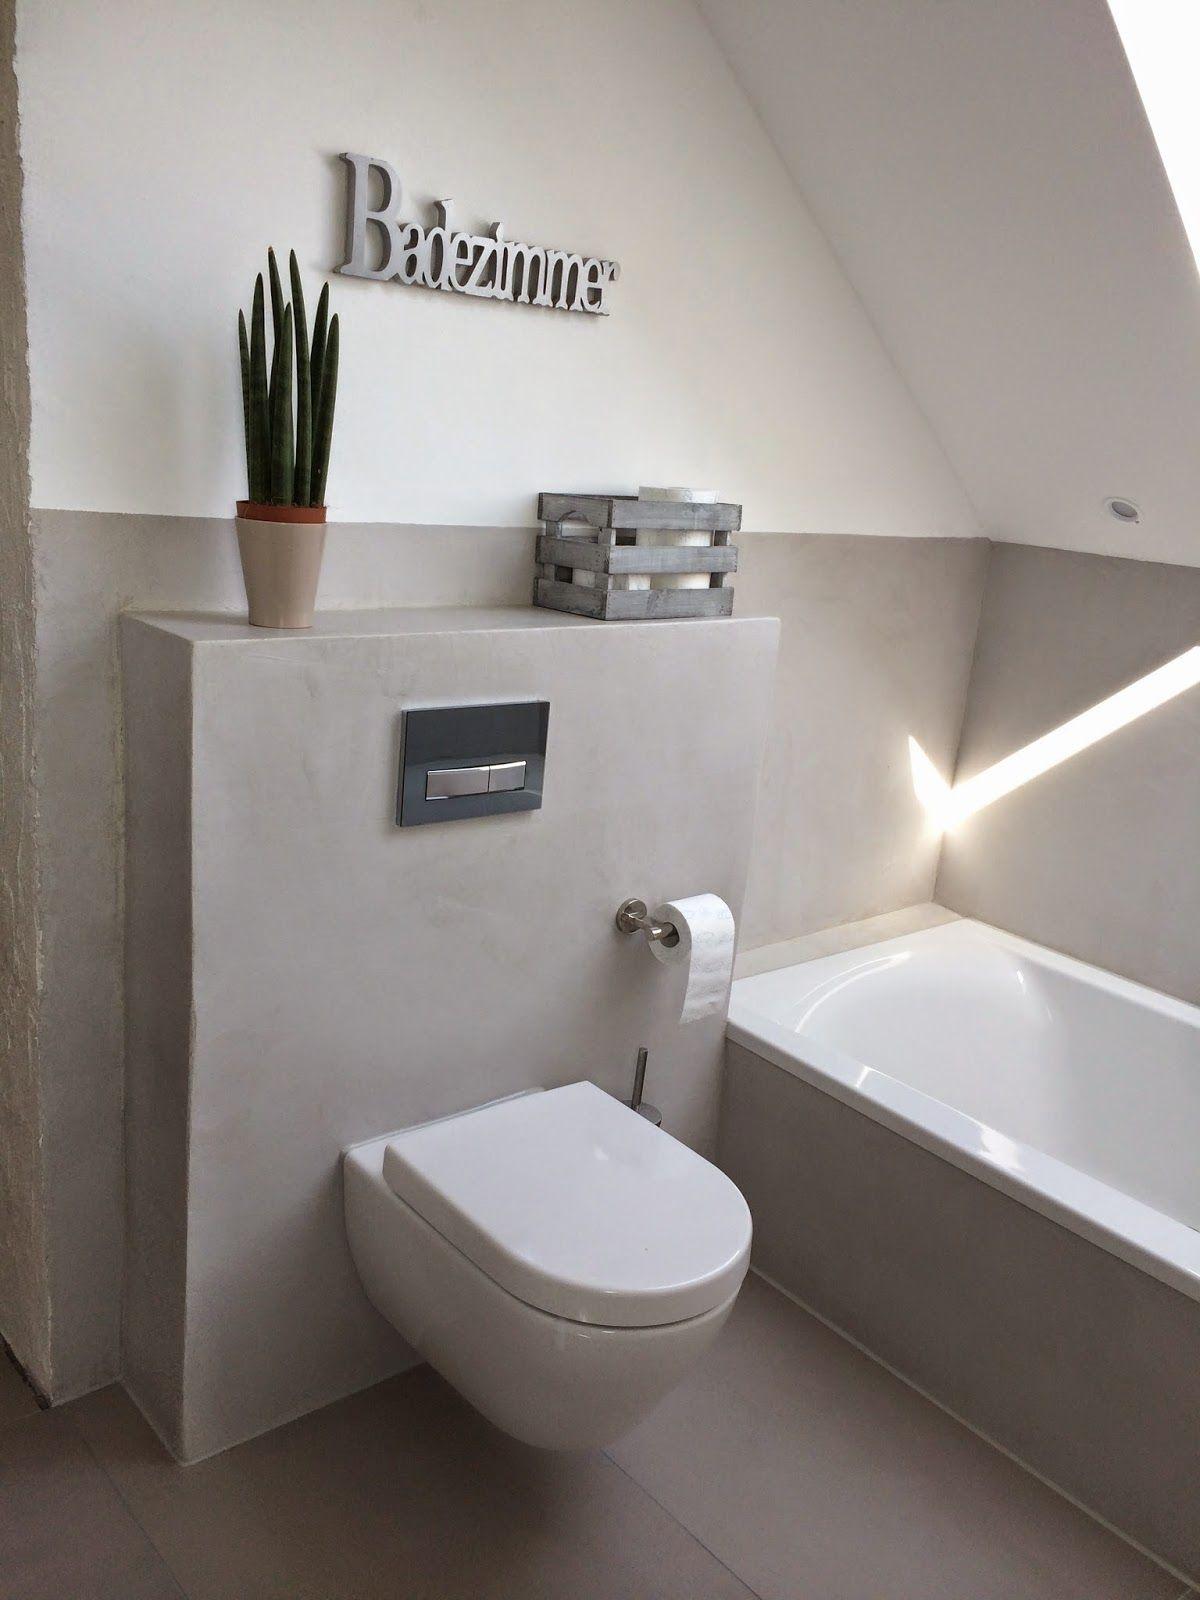 September 2014 Badezimmer Kleine Toilette Badezimmerideen